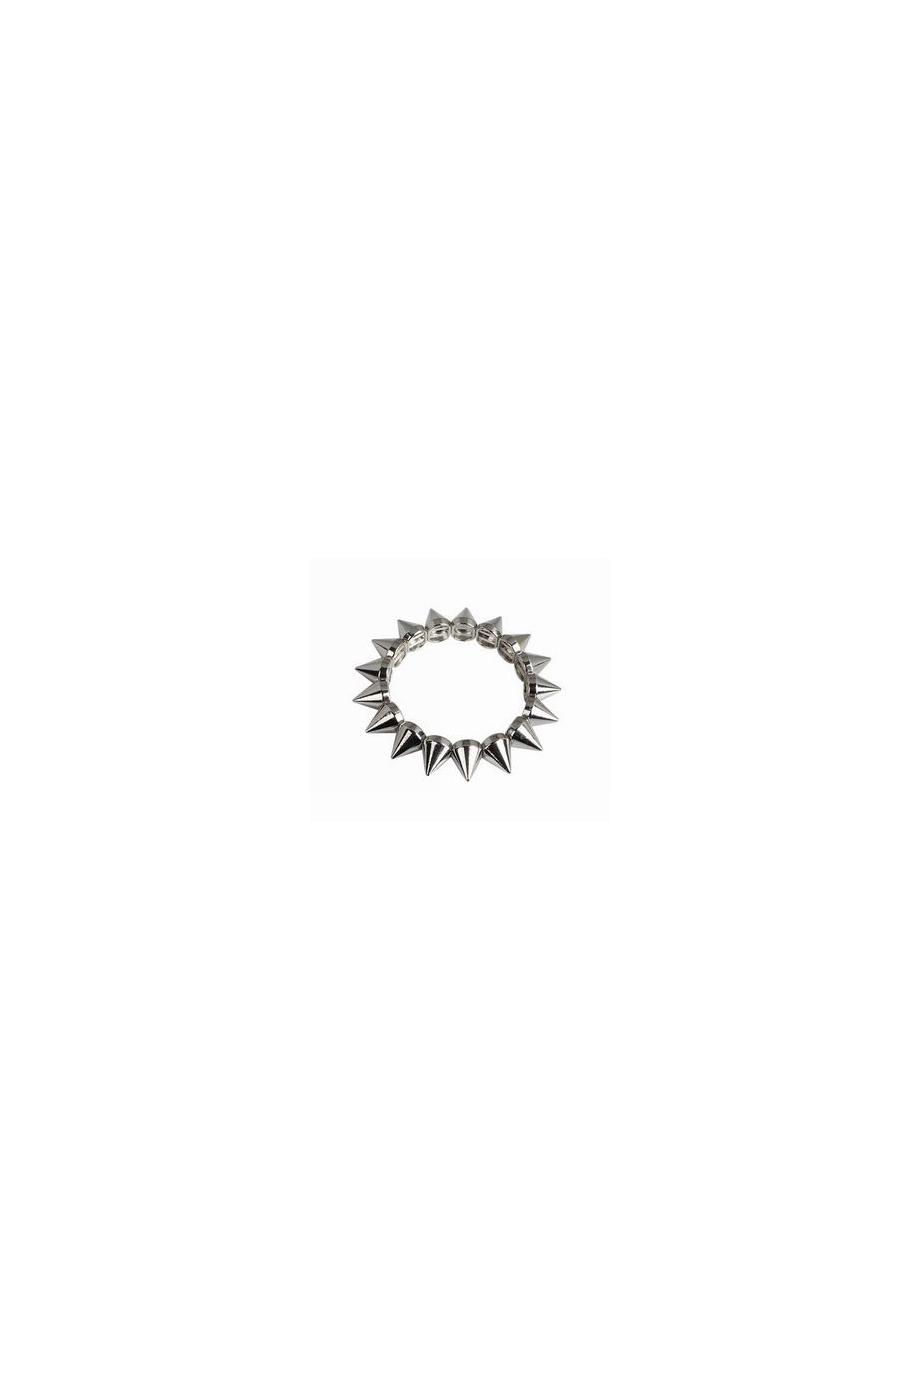 ROWTAG Spiky Bracelet Runway Accessories   The Latest Women Fashion Online Accessories & Jewelry   JESSICABUURMAN [3206] - $29.00 : JESSICABUURMAN.COM